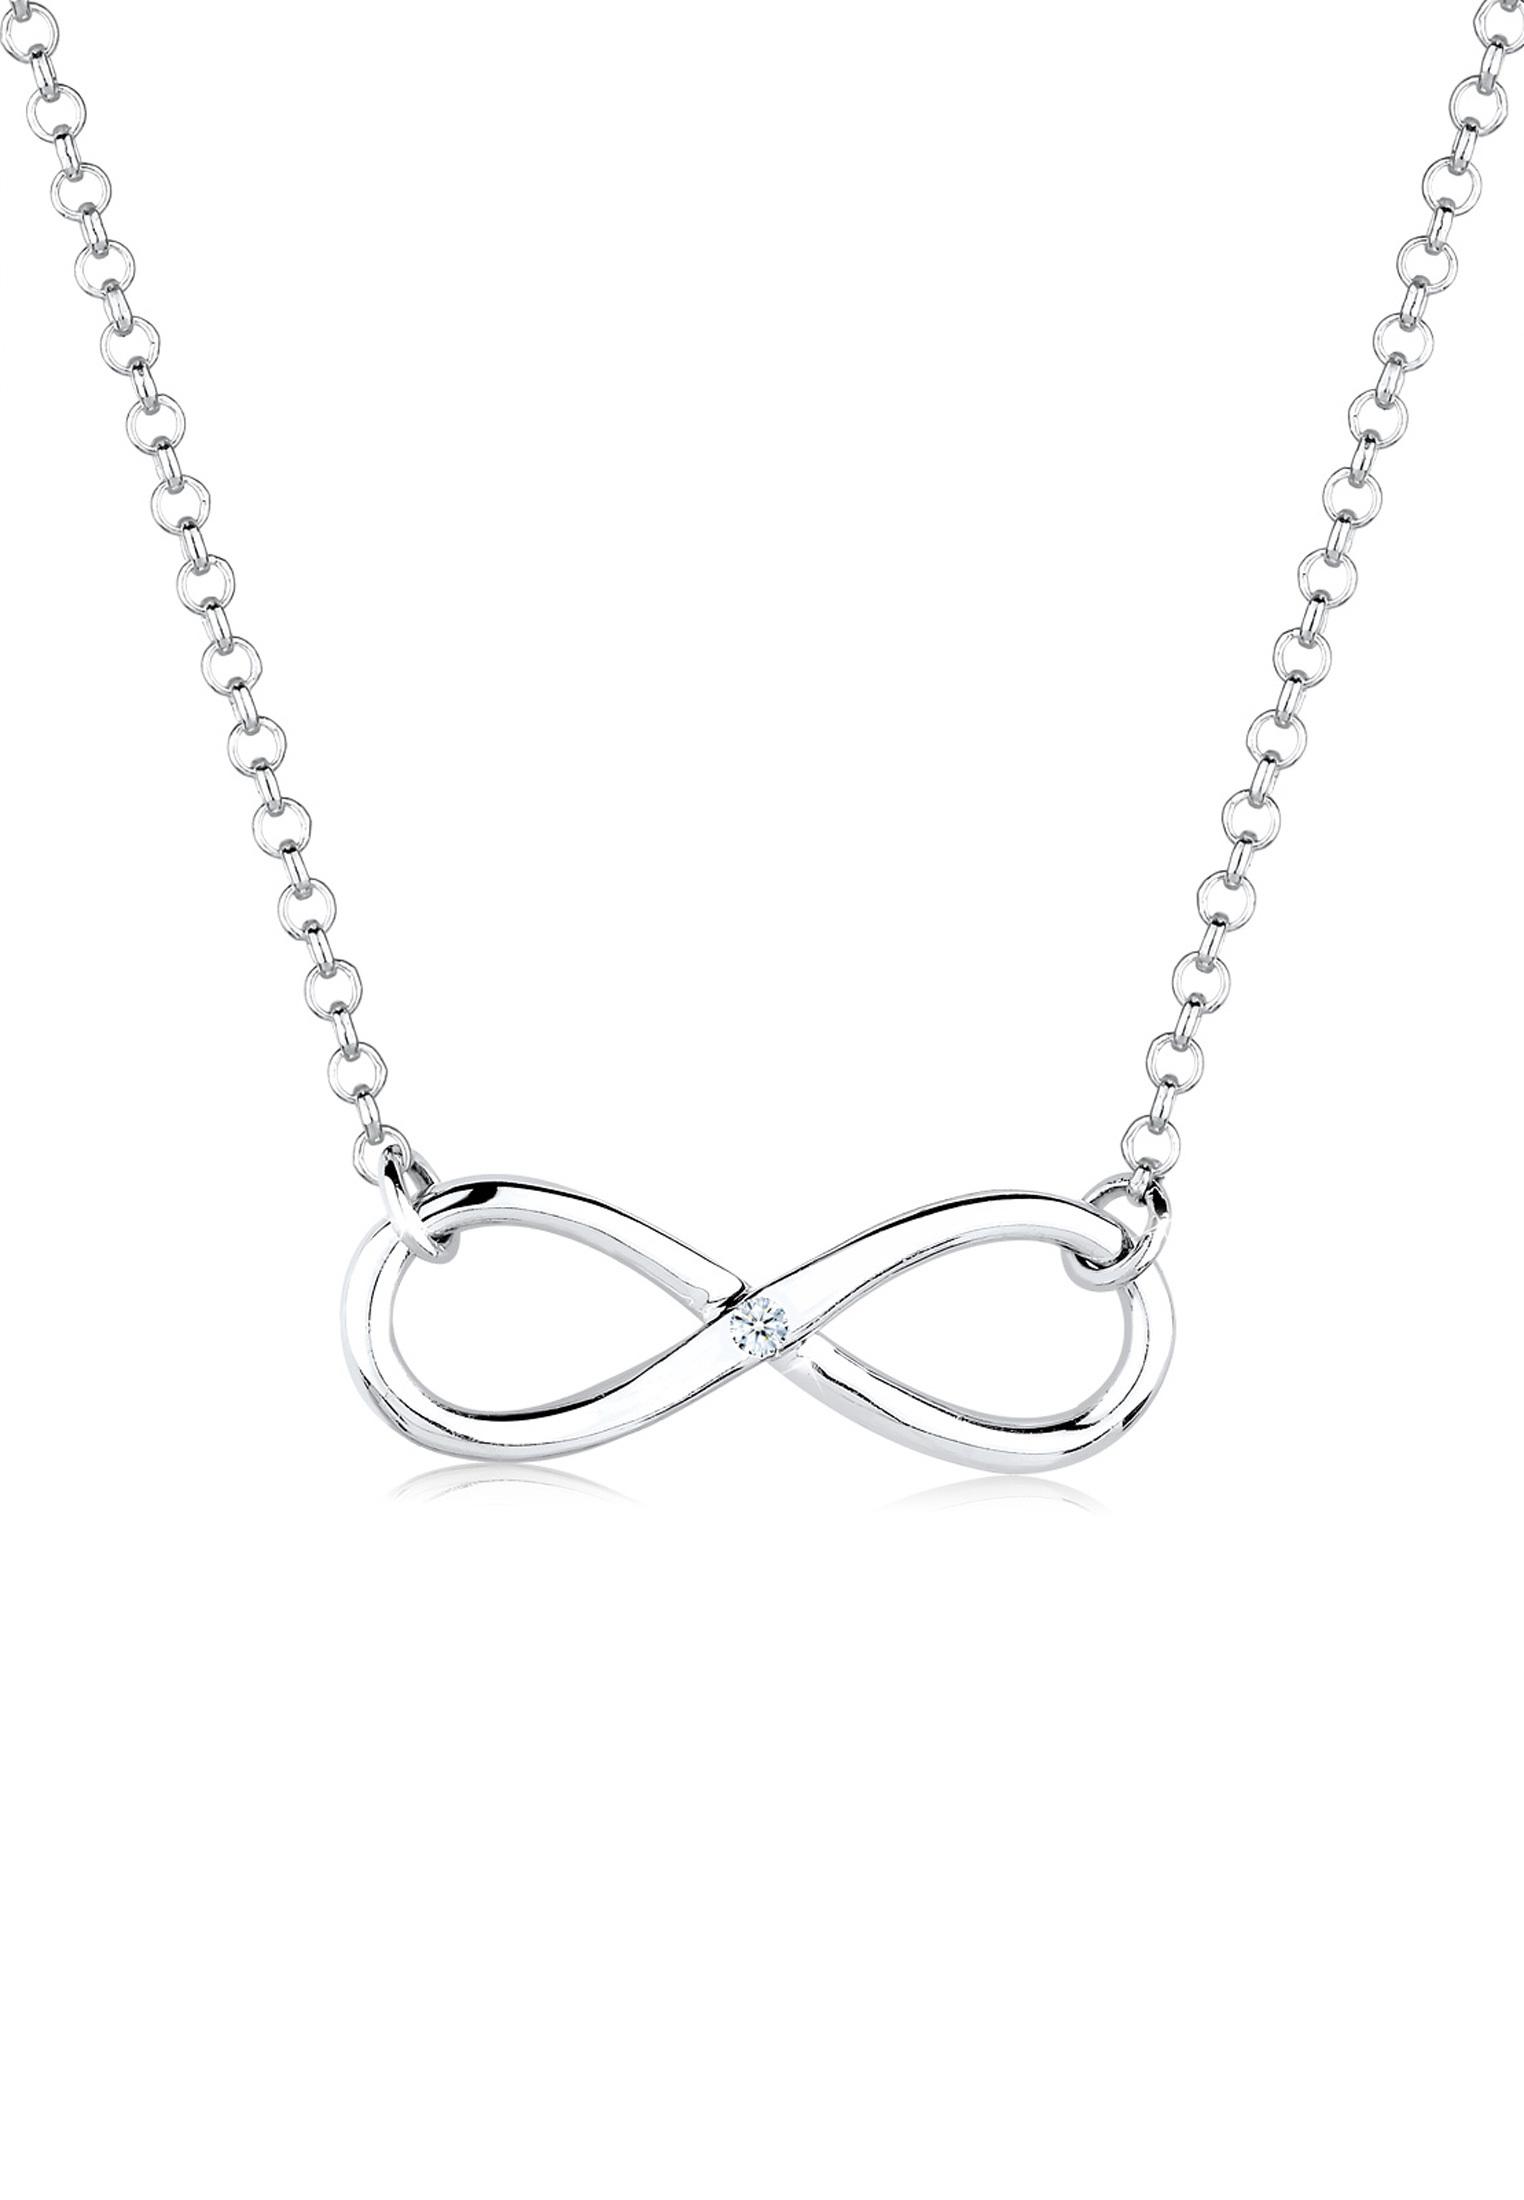 Halskette Infinity   Diamant ( Weiß, 0,03 ct )   925er Sterling Silber